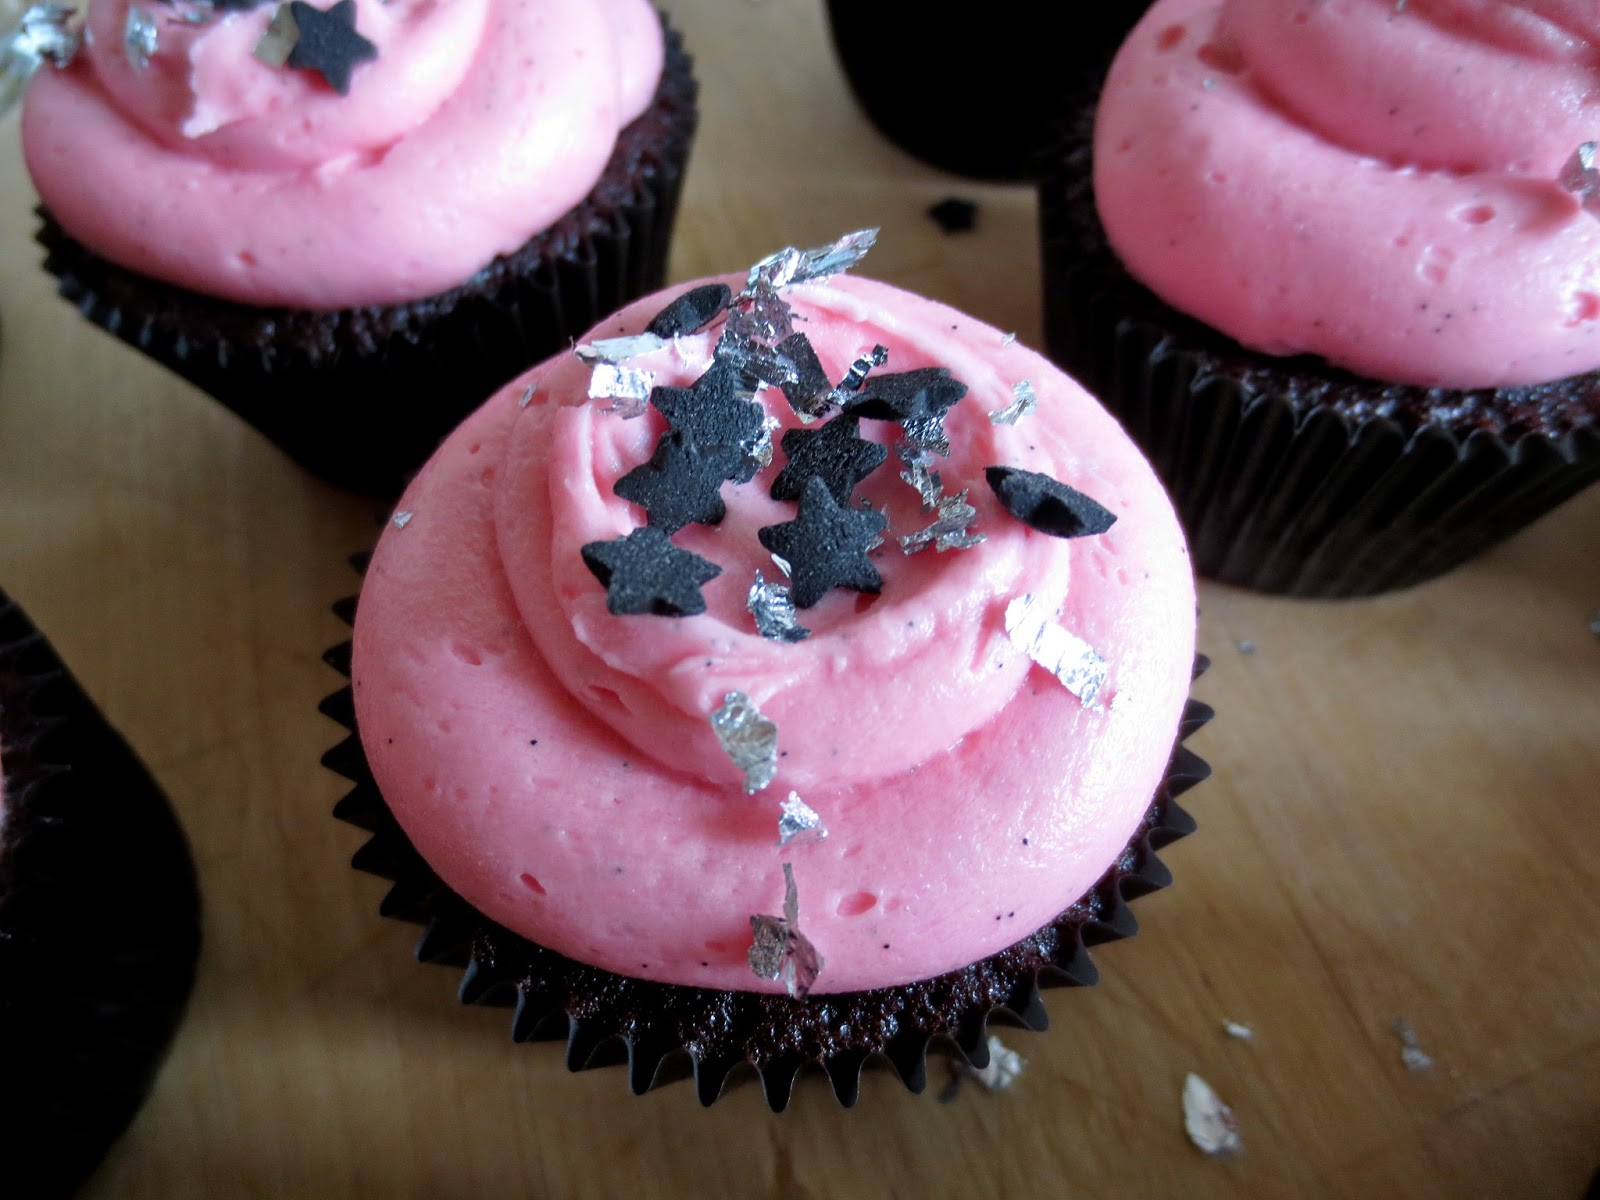 Cupcake Decorating Ideas Pink And Black : med k?rlig hilsen: Pink and Black Cupcakes